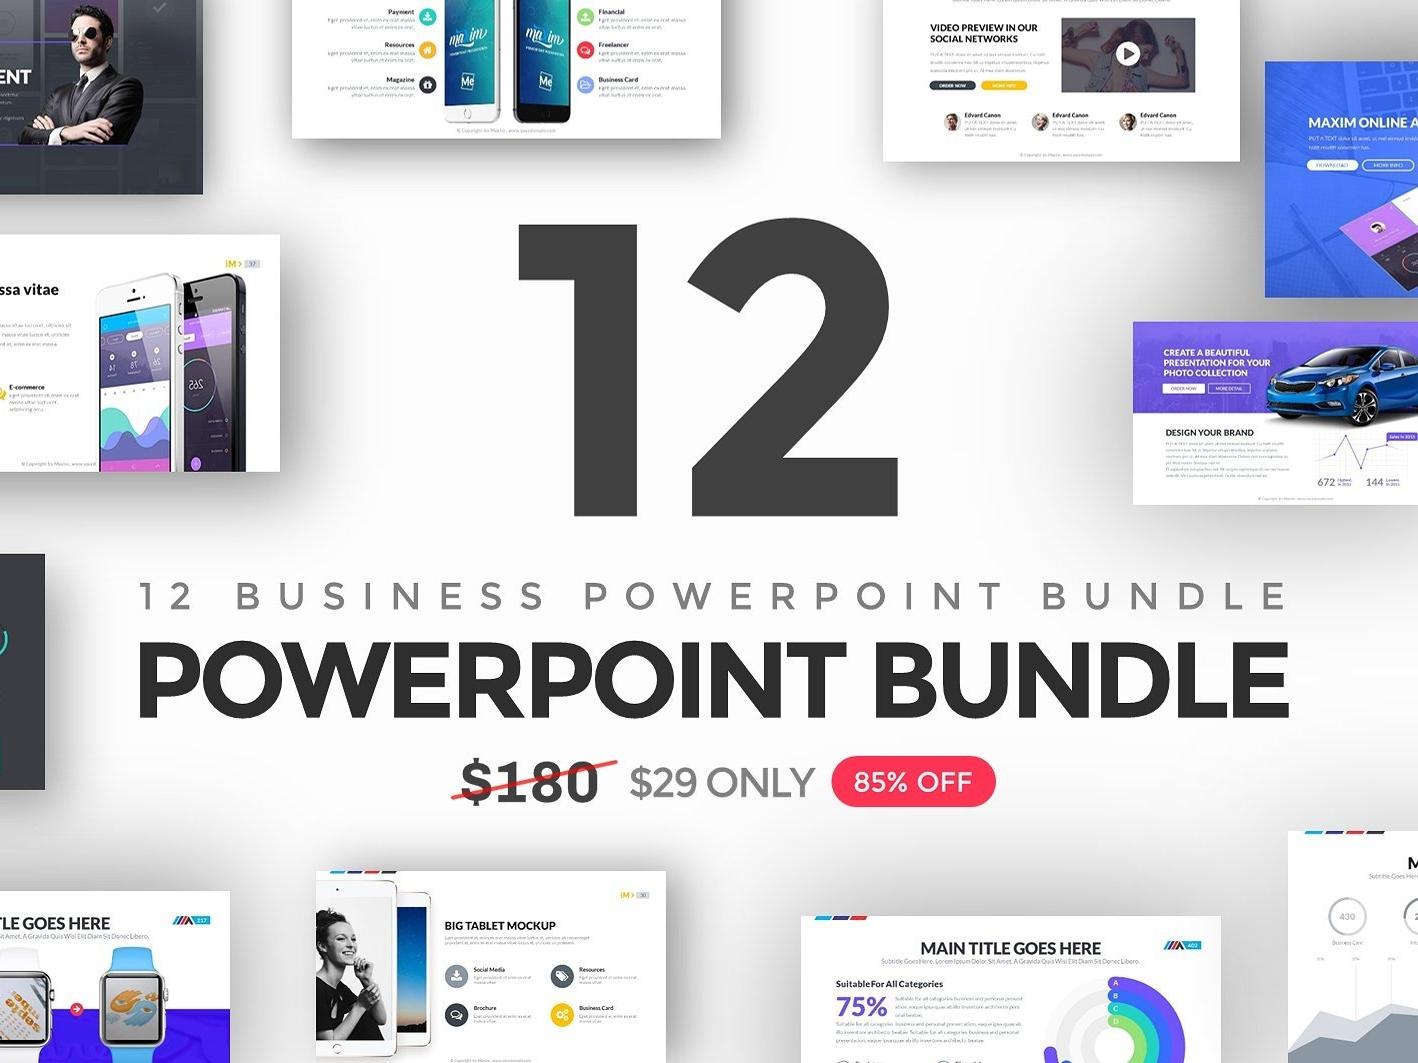 12 in 1 Business Powerpoint Bundle arabic rtl powerpoint template bundle template presentation maxim free powerpoint slide ppt creativemarket pptx powerpoint meemslide